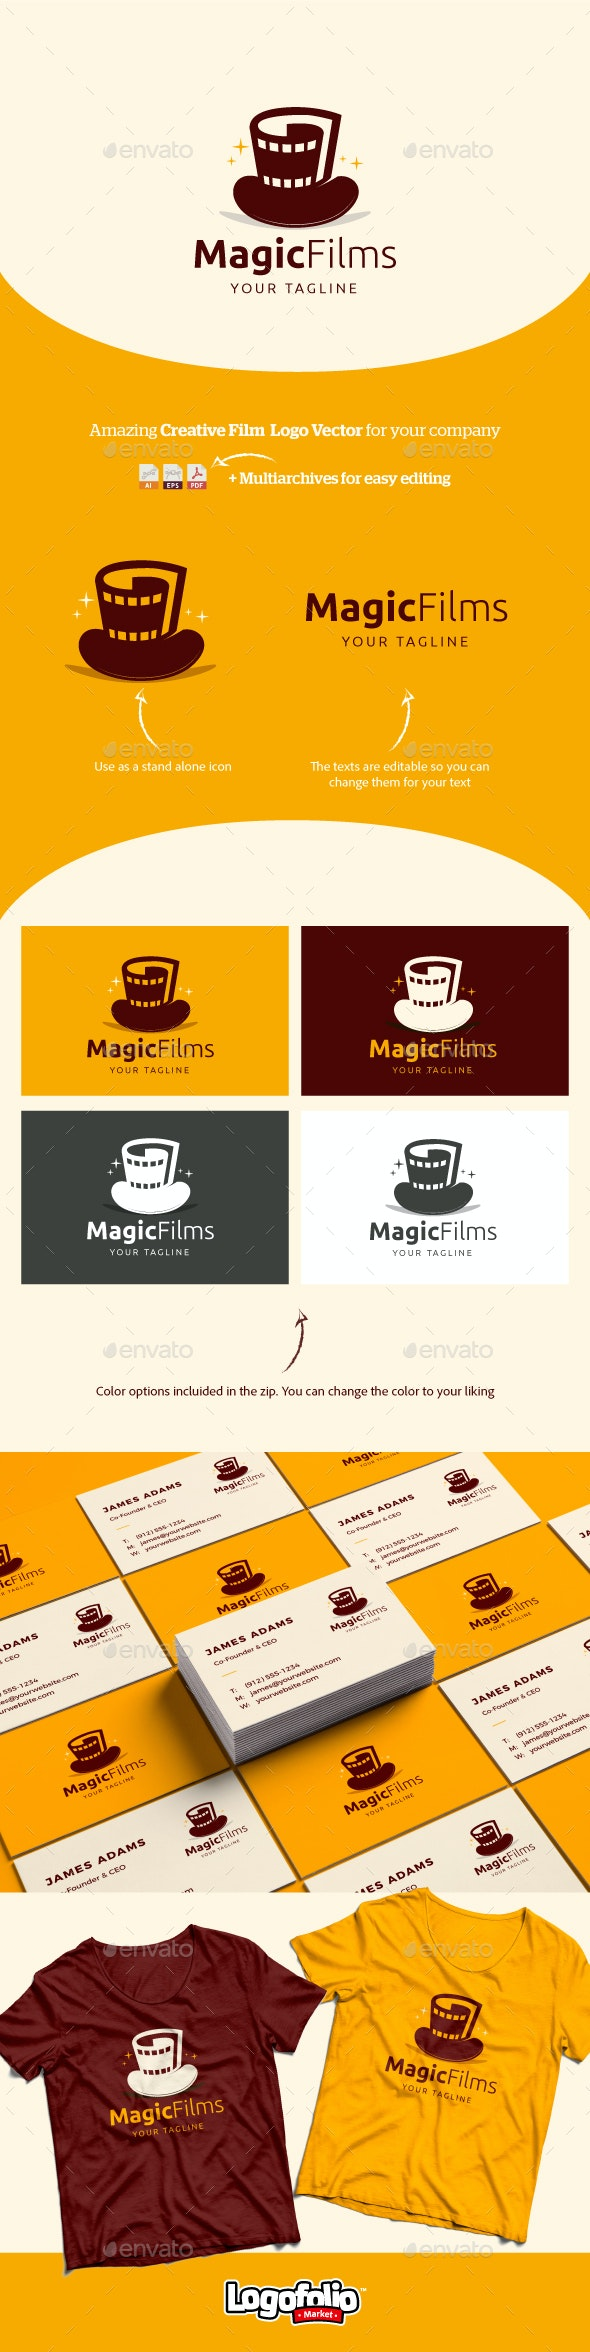 MagicFilms Logo Vector - Company Logo Templates